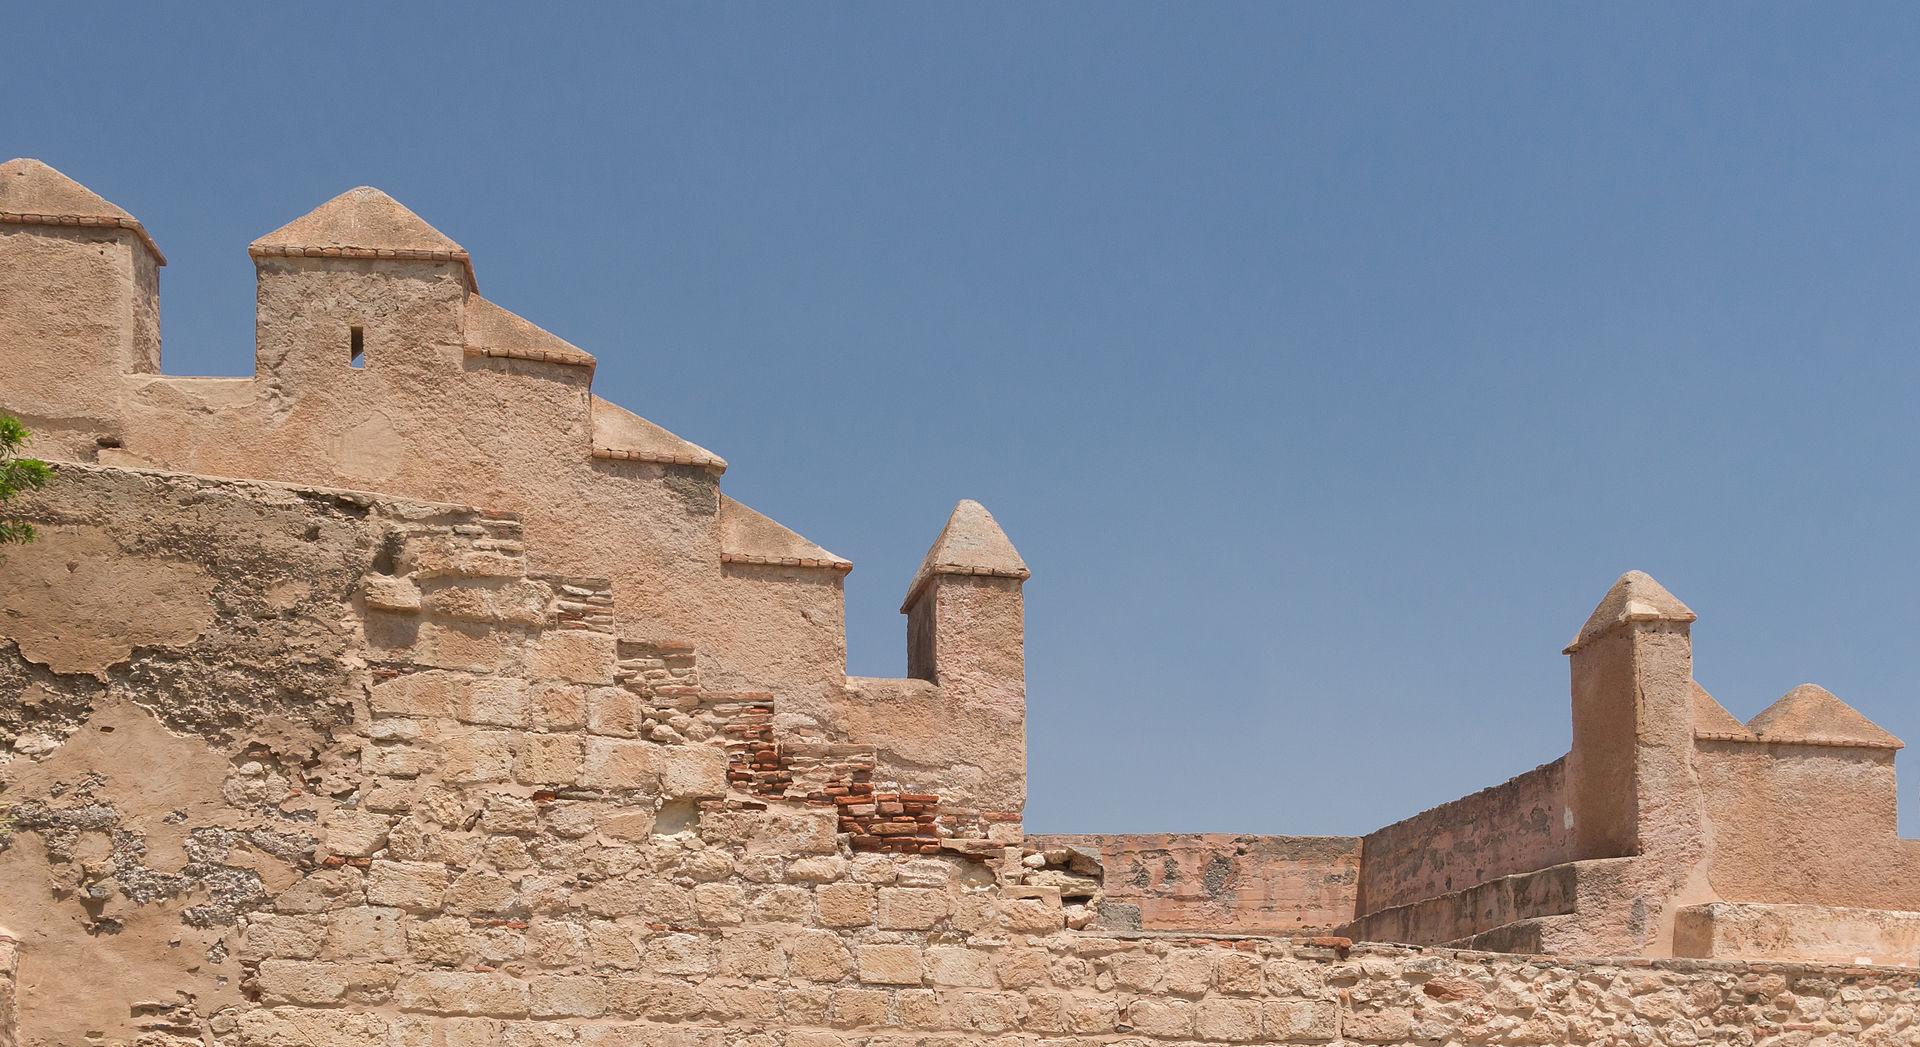 Architectural_details,_Alcazaba,_Almeria,_Spain.jpg